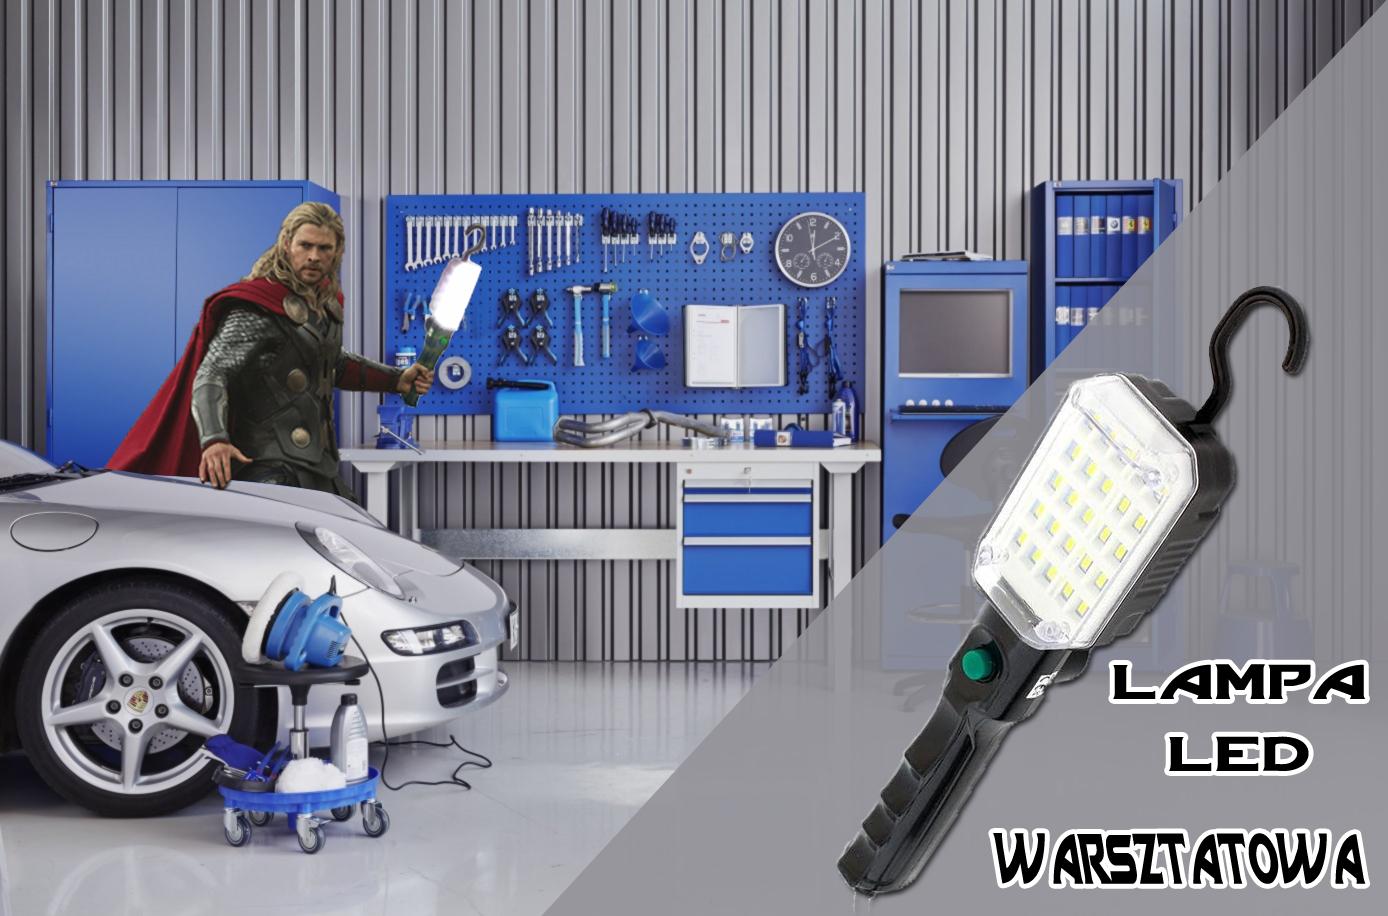 lampa led warsztatowa thor.jpg